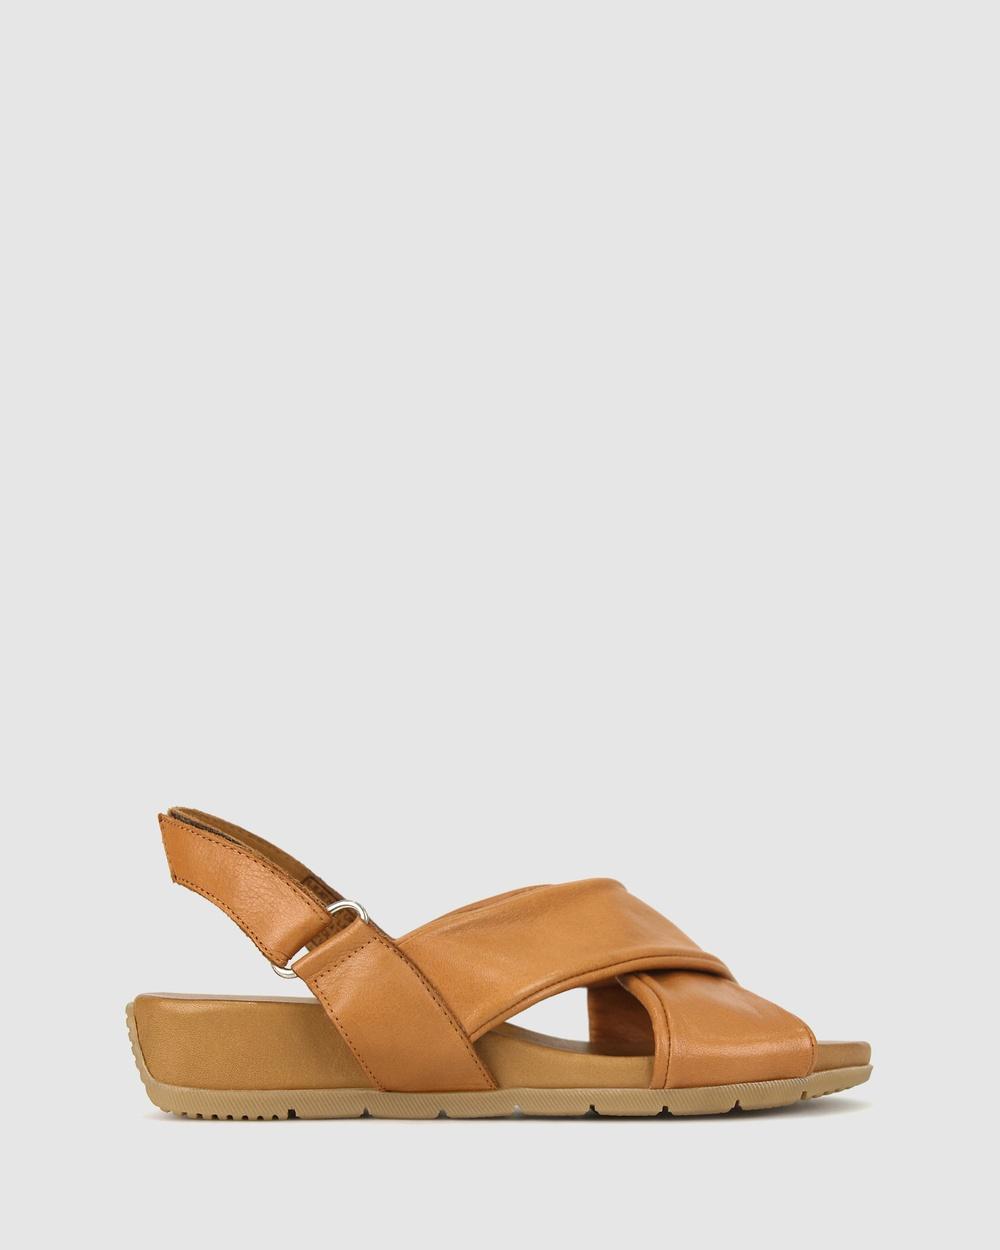 Airflex Zada Leather Wedge Sandals Tan